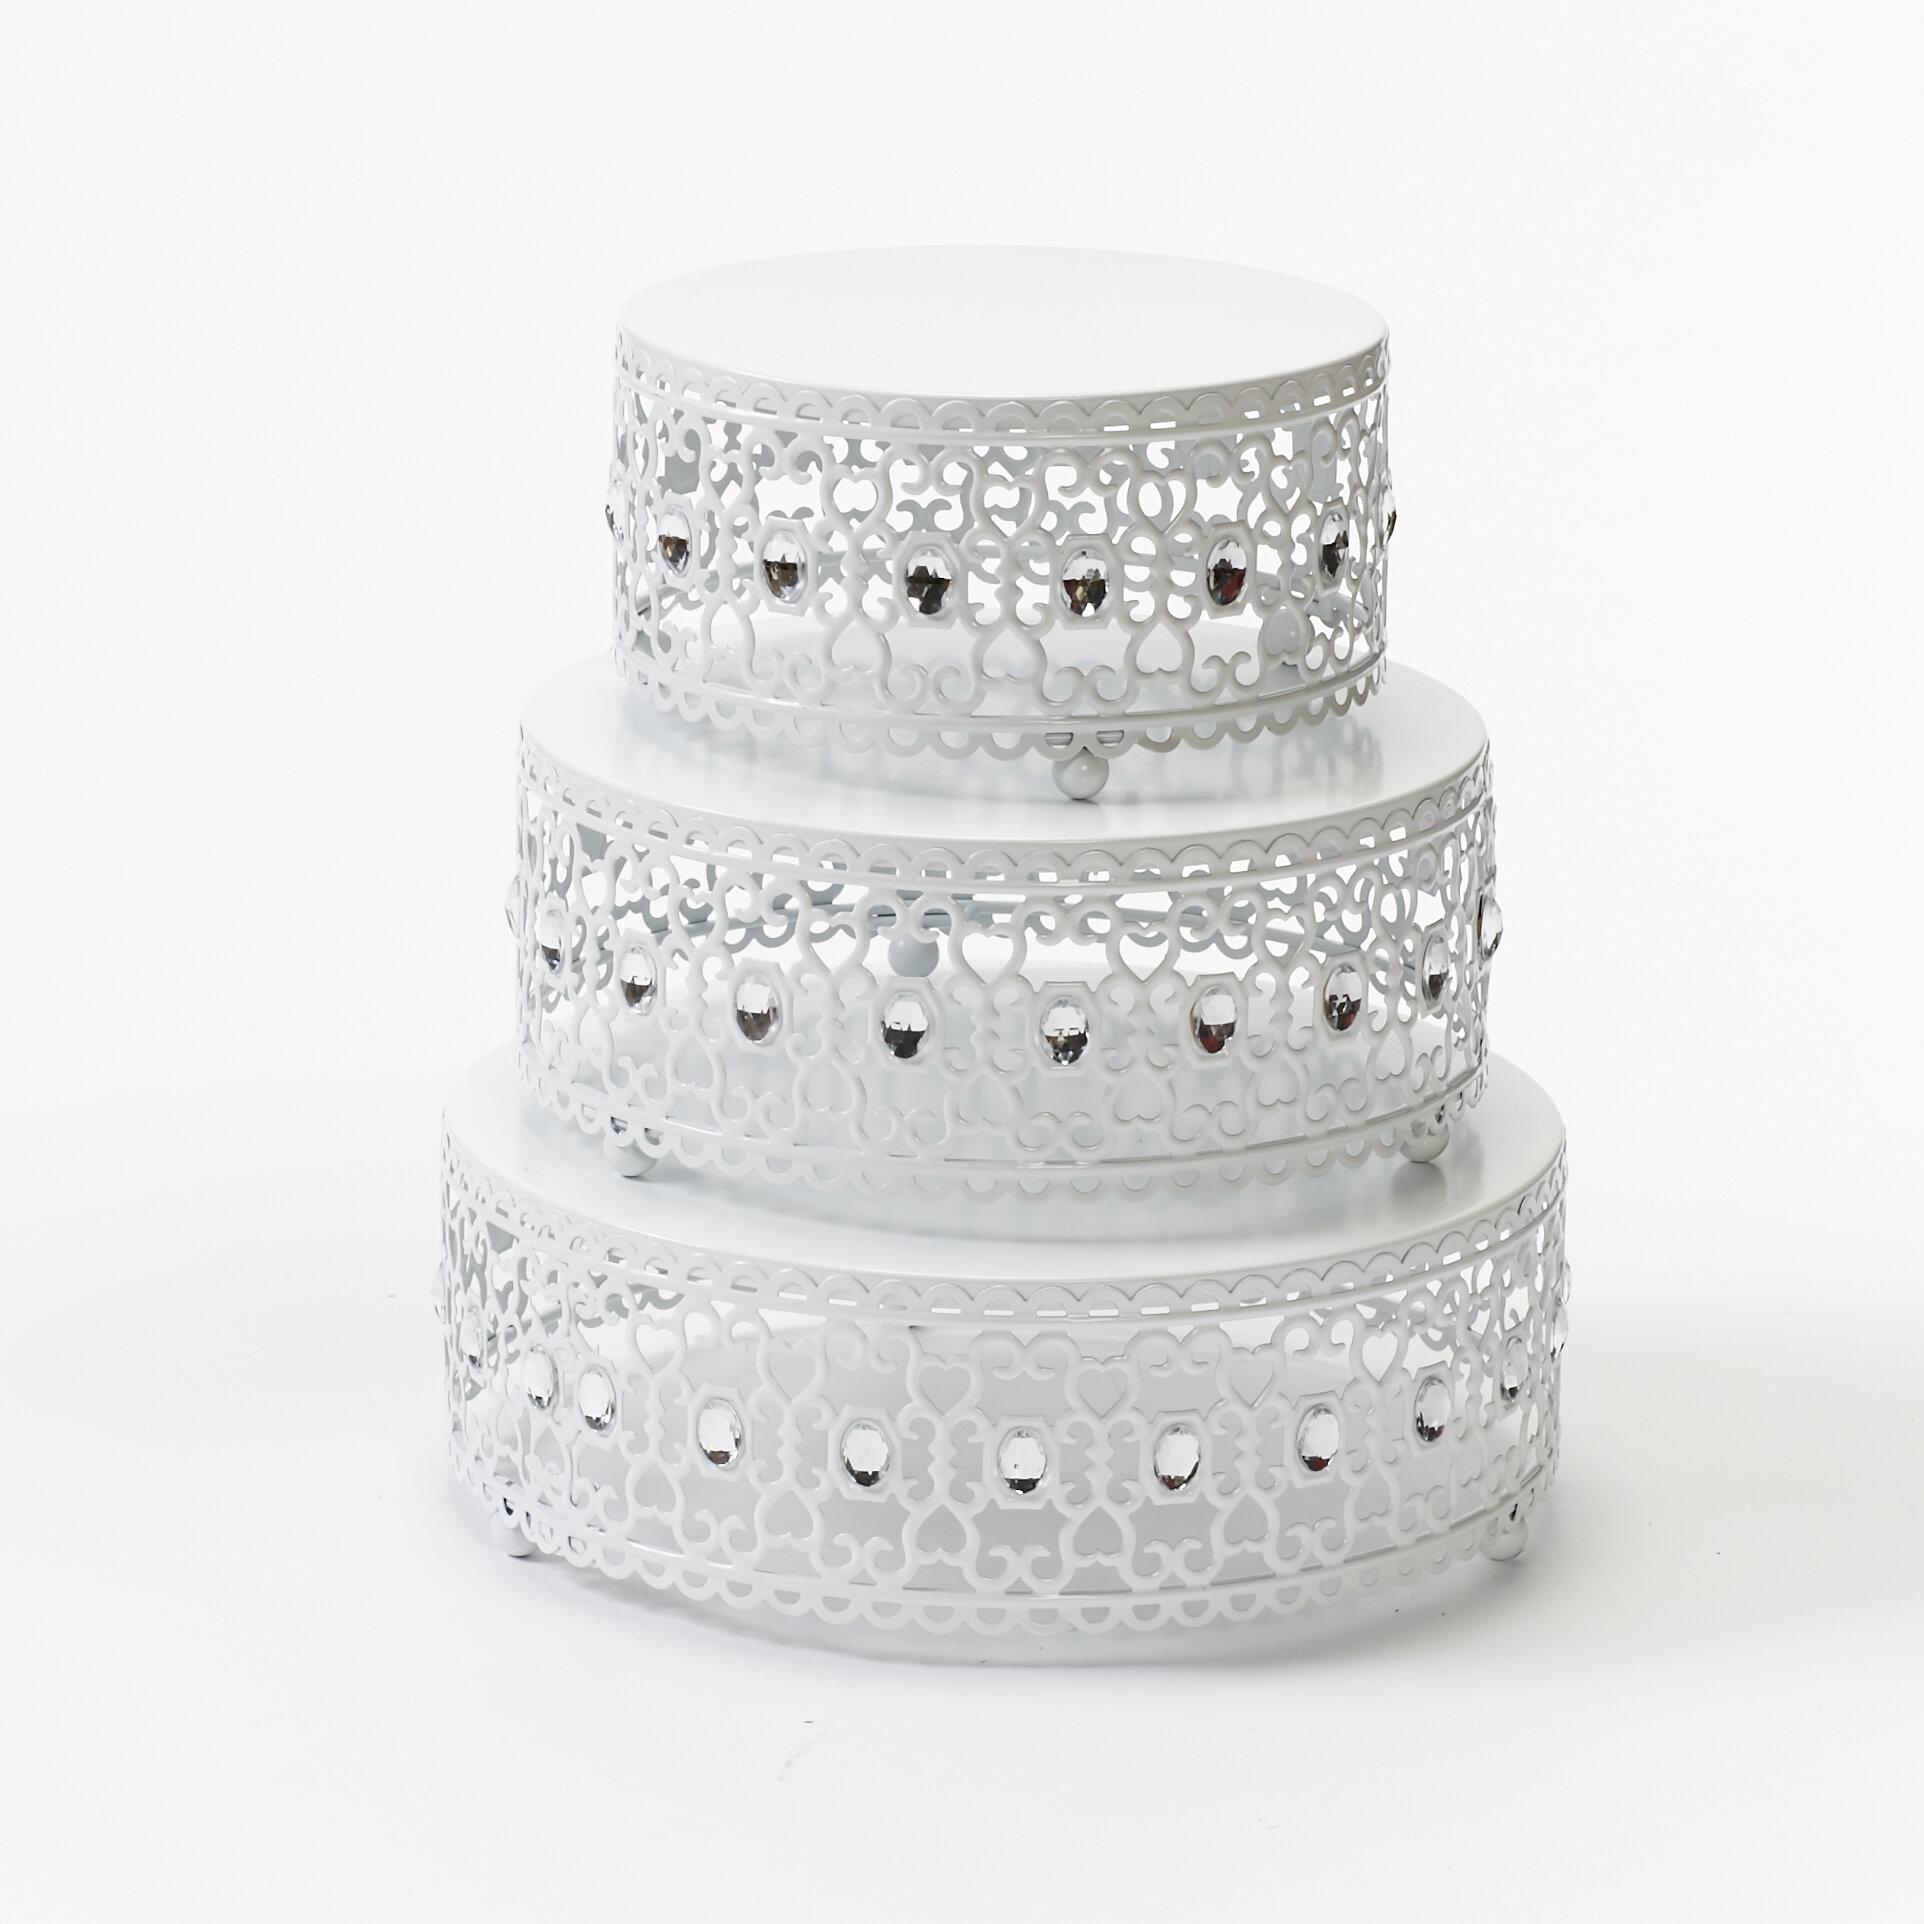 Loop Band Cake Stand